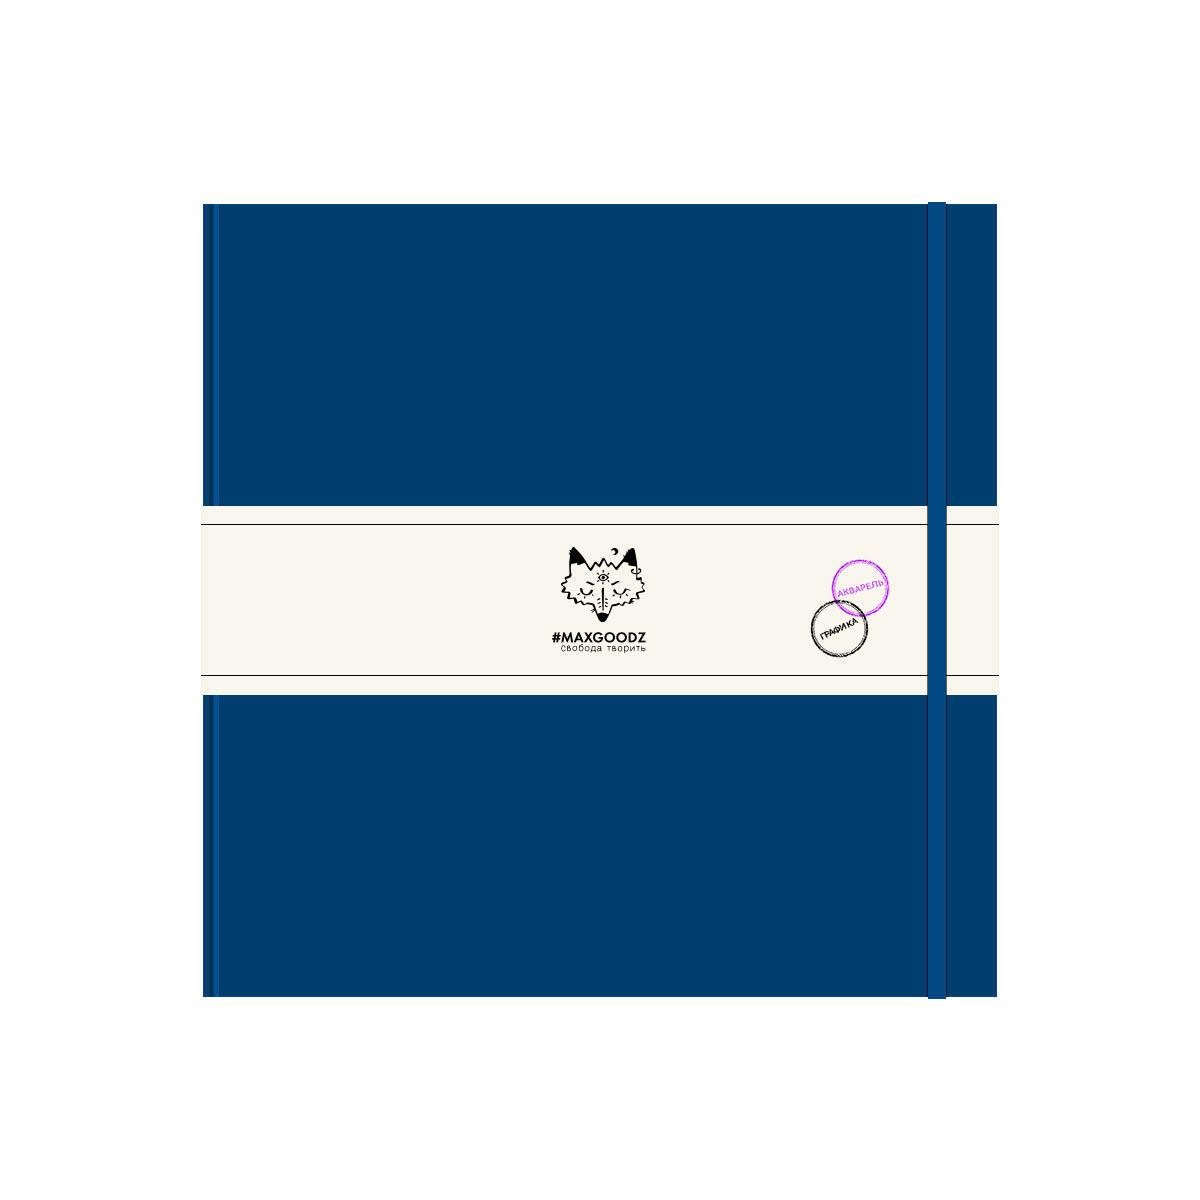 Купить Скетчбук для акварели в твёрдом переплёте Maxgoodz Heavy Aqua 21х21 см, 48 л, 230 г Синий, Россия